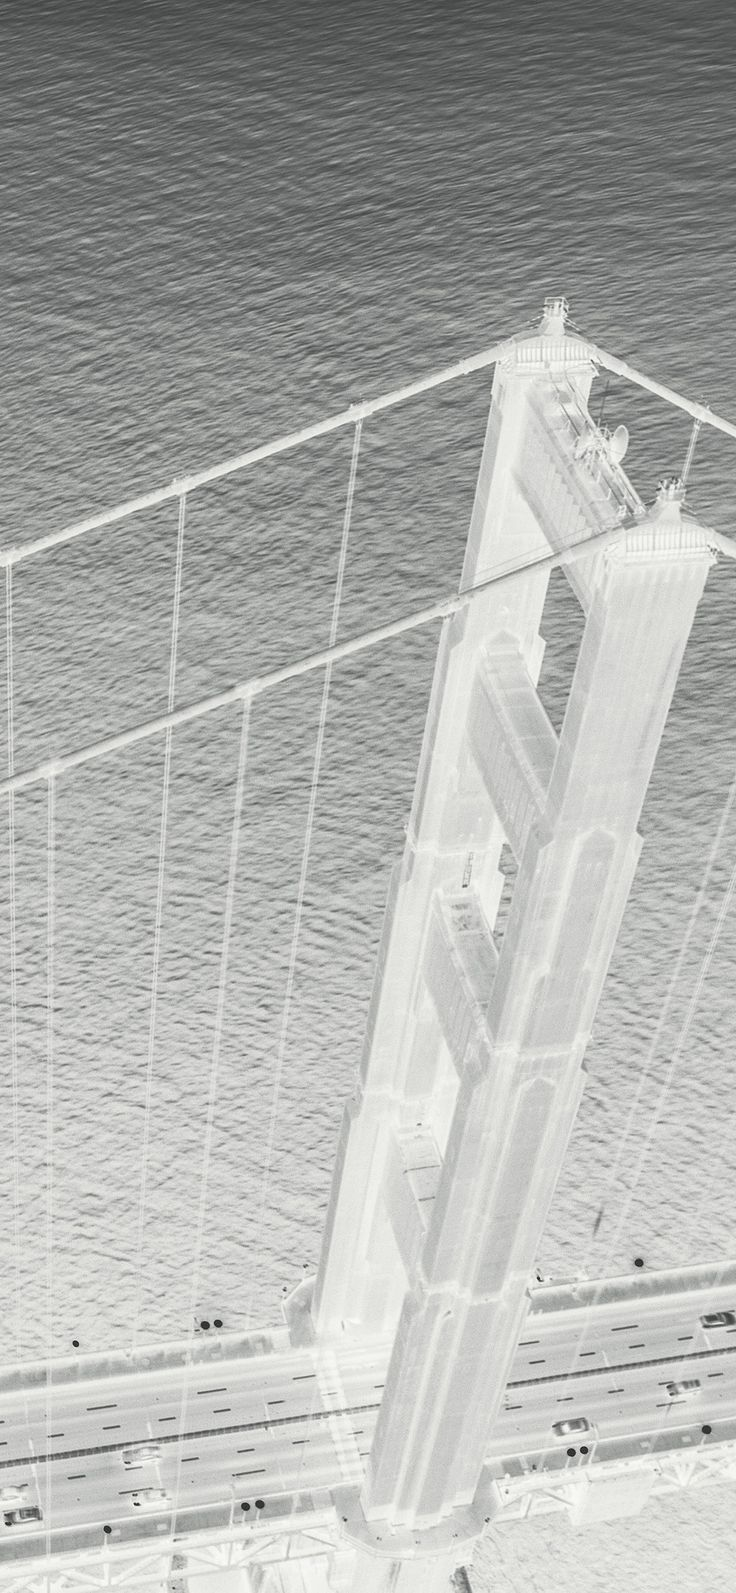 Iphone X Wallpaper Ms53 Bridge River Nature City White Bw Via